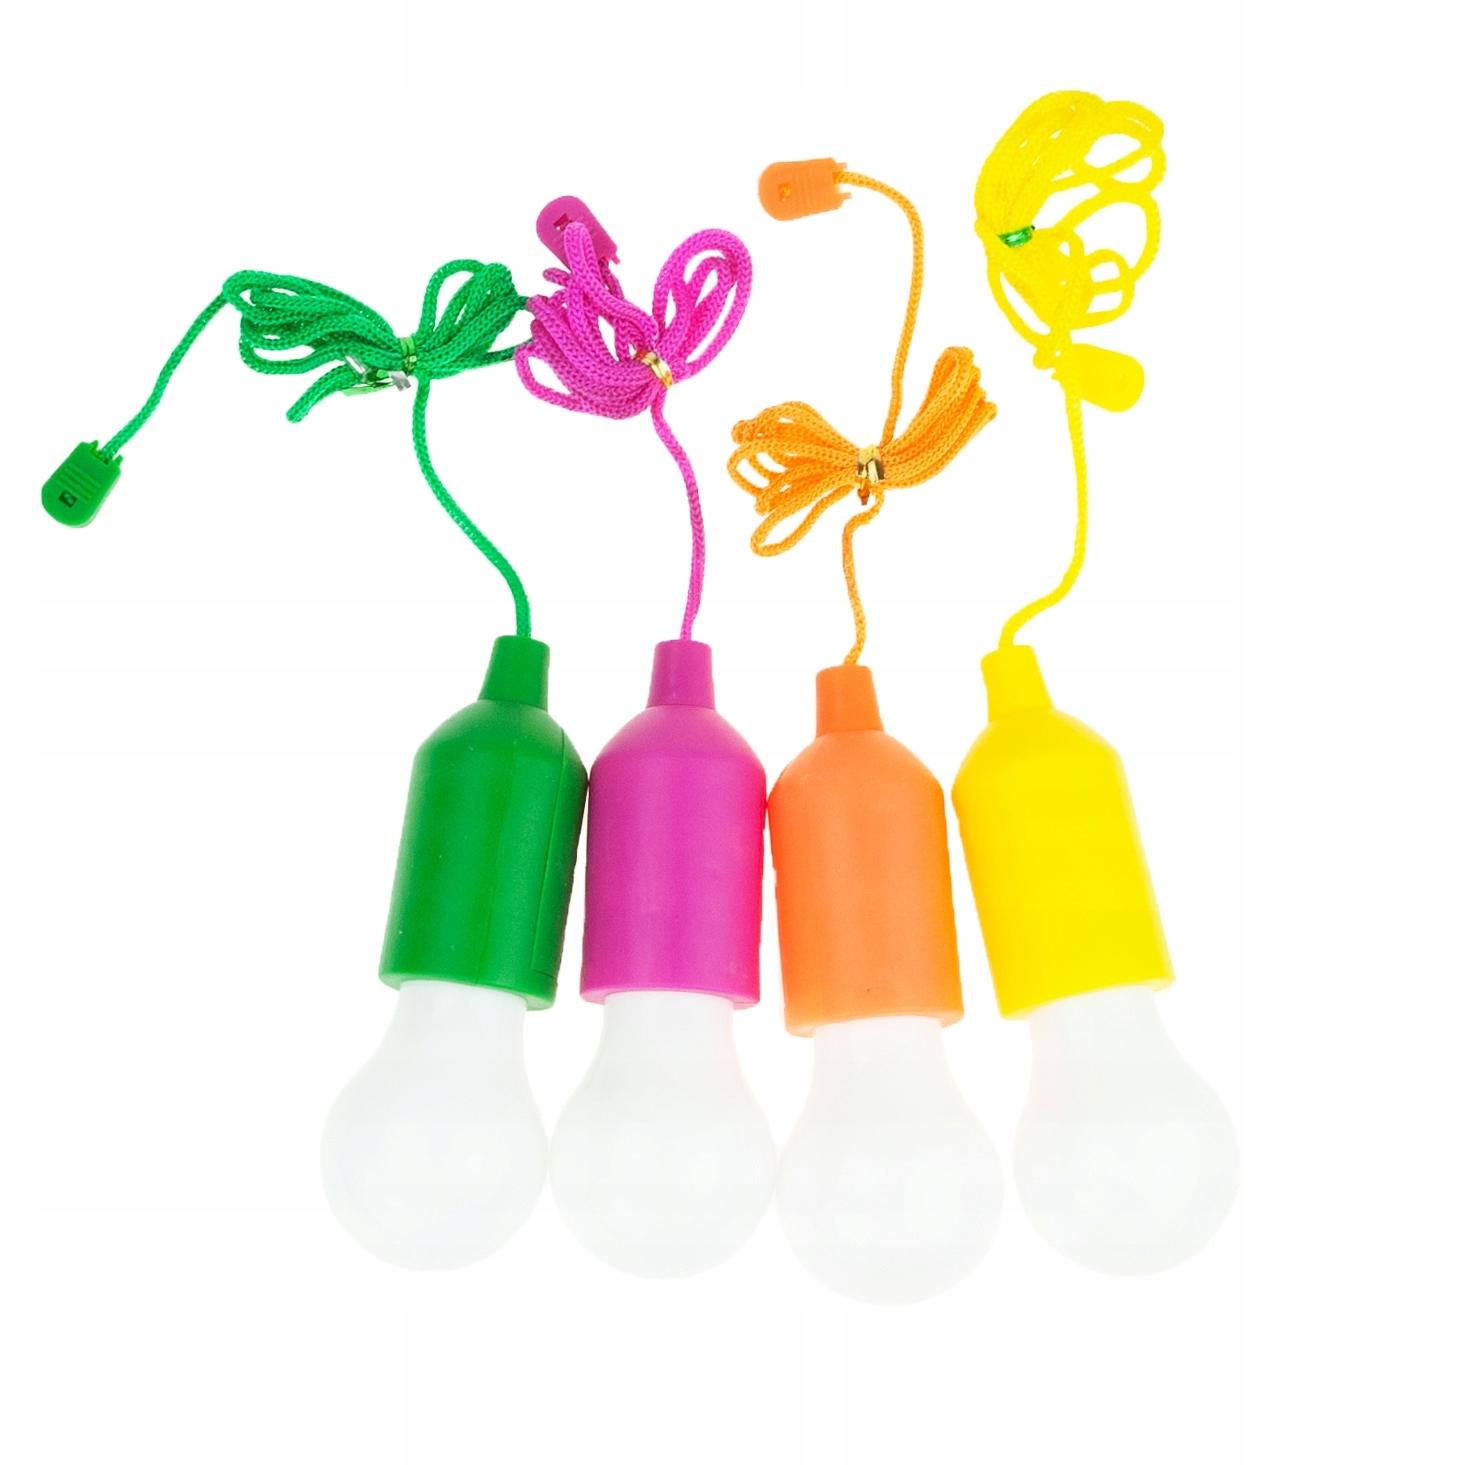 Lampki LED Sznurku Baterie kolorowe Żarówka 4szt